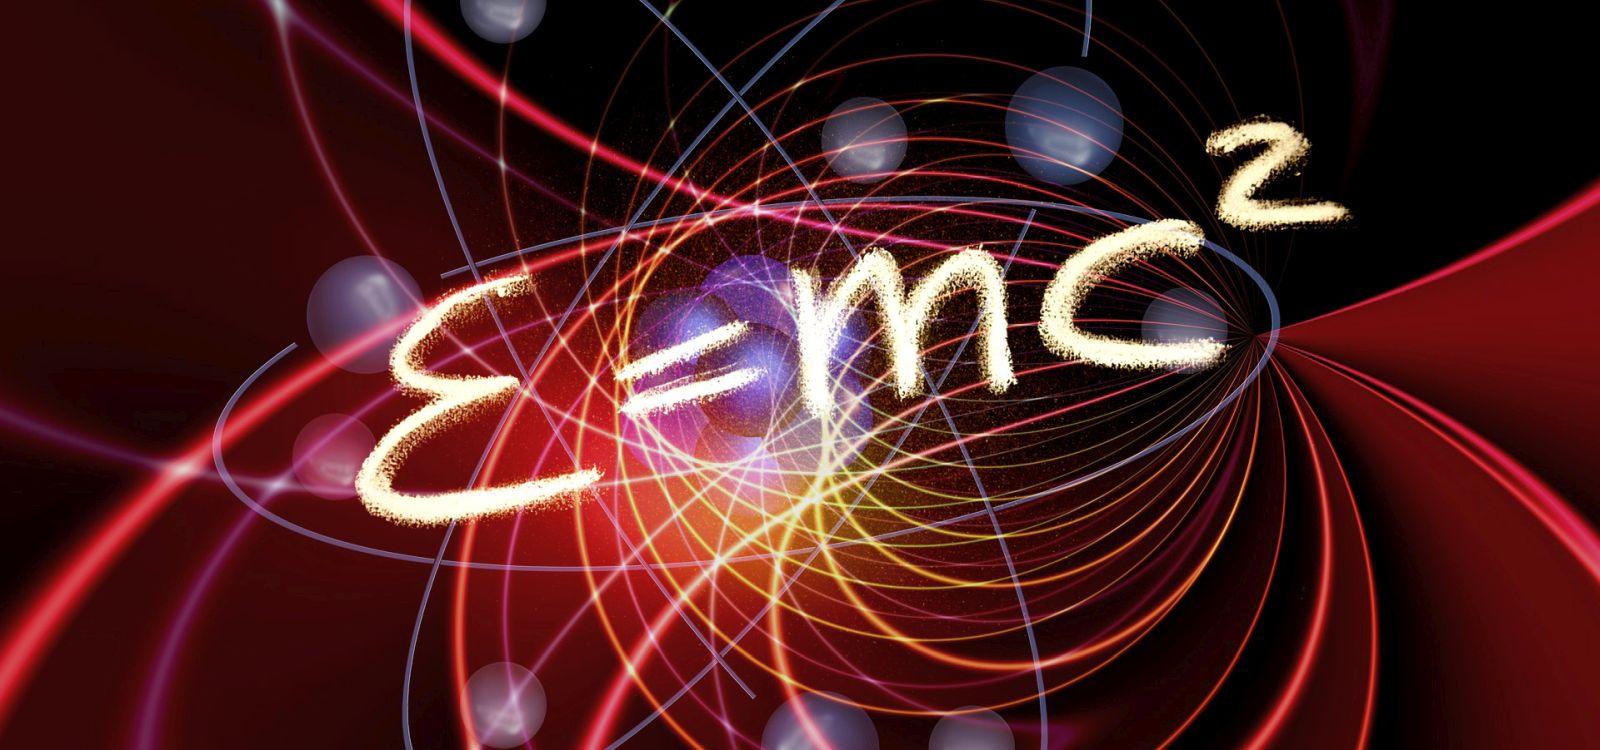 Fizika, Salam, Abdus, nobelova nagrada, matematika, Islam, prvi musliman,